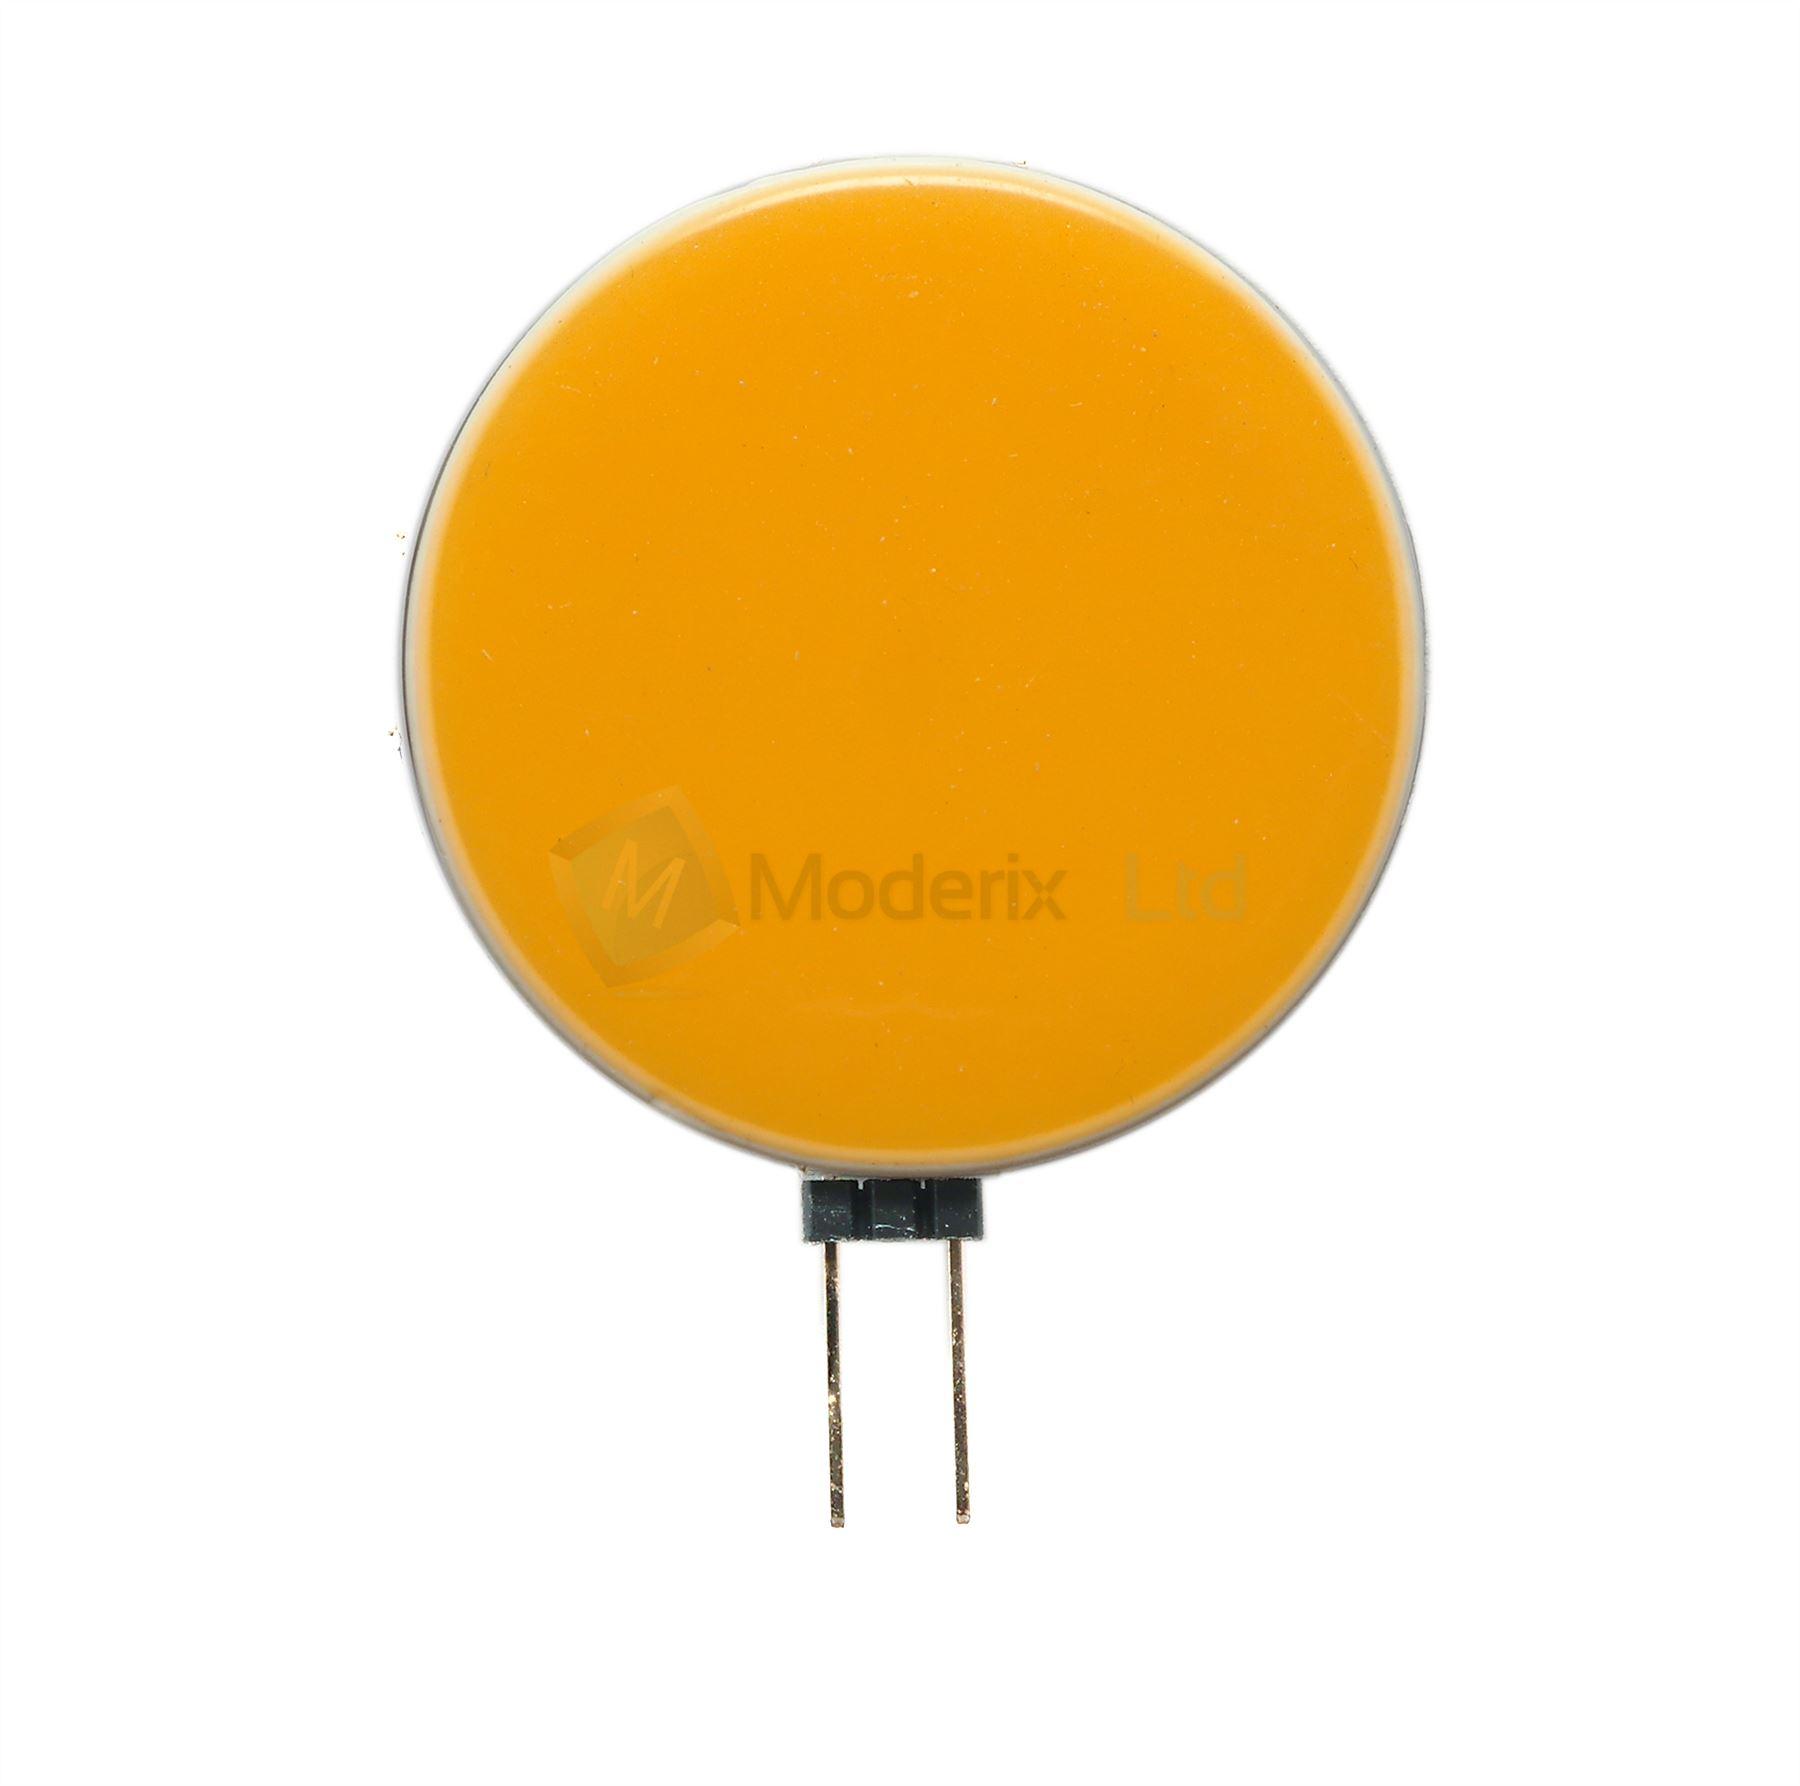 G4 led disc dc 12v cob light bulbs lamps car boat caravan for 12v table lamps for boats